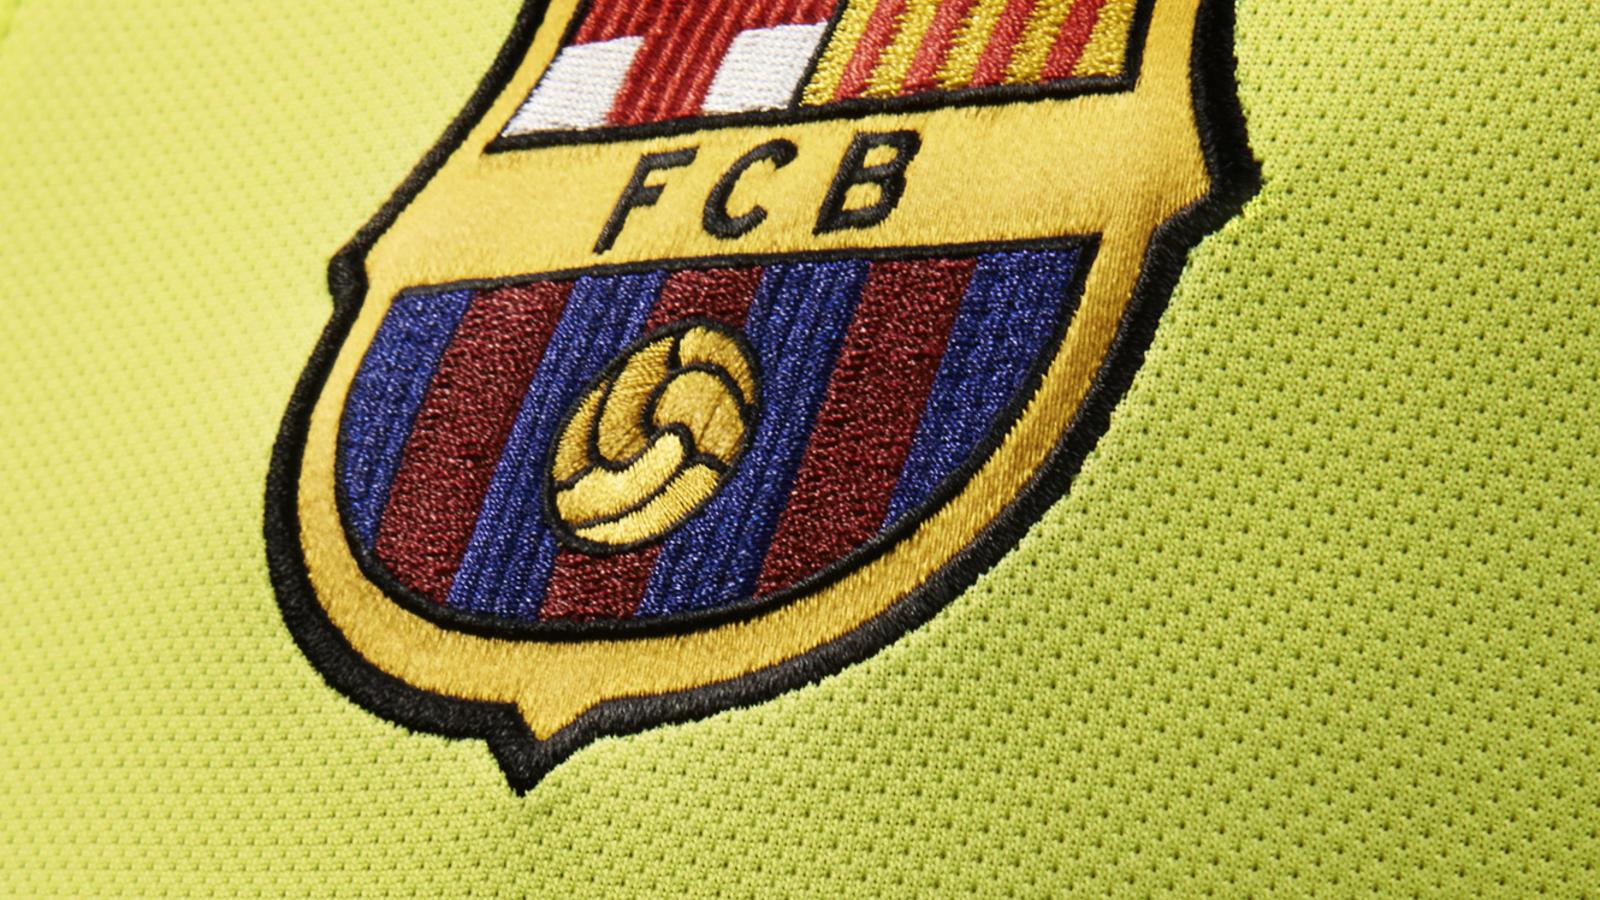 Ho14 Fb Flash Flood Barcelona Crest